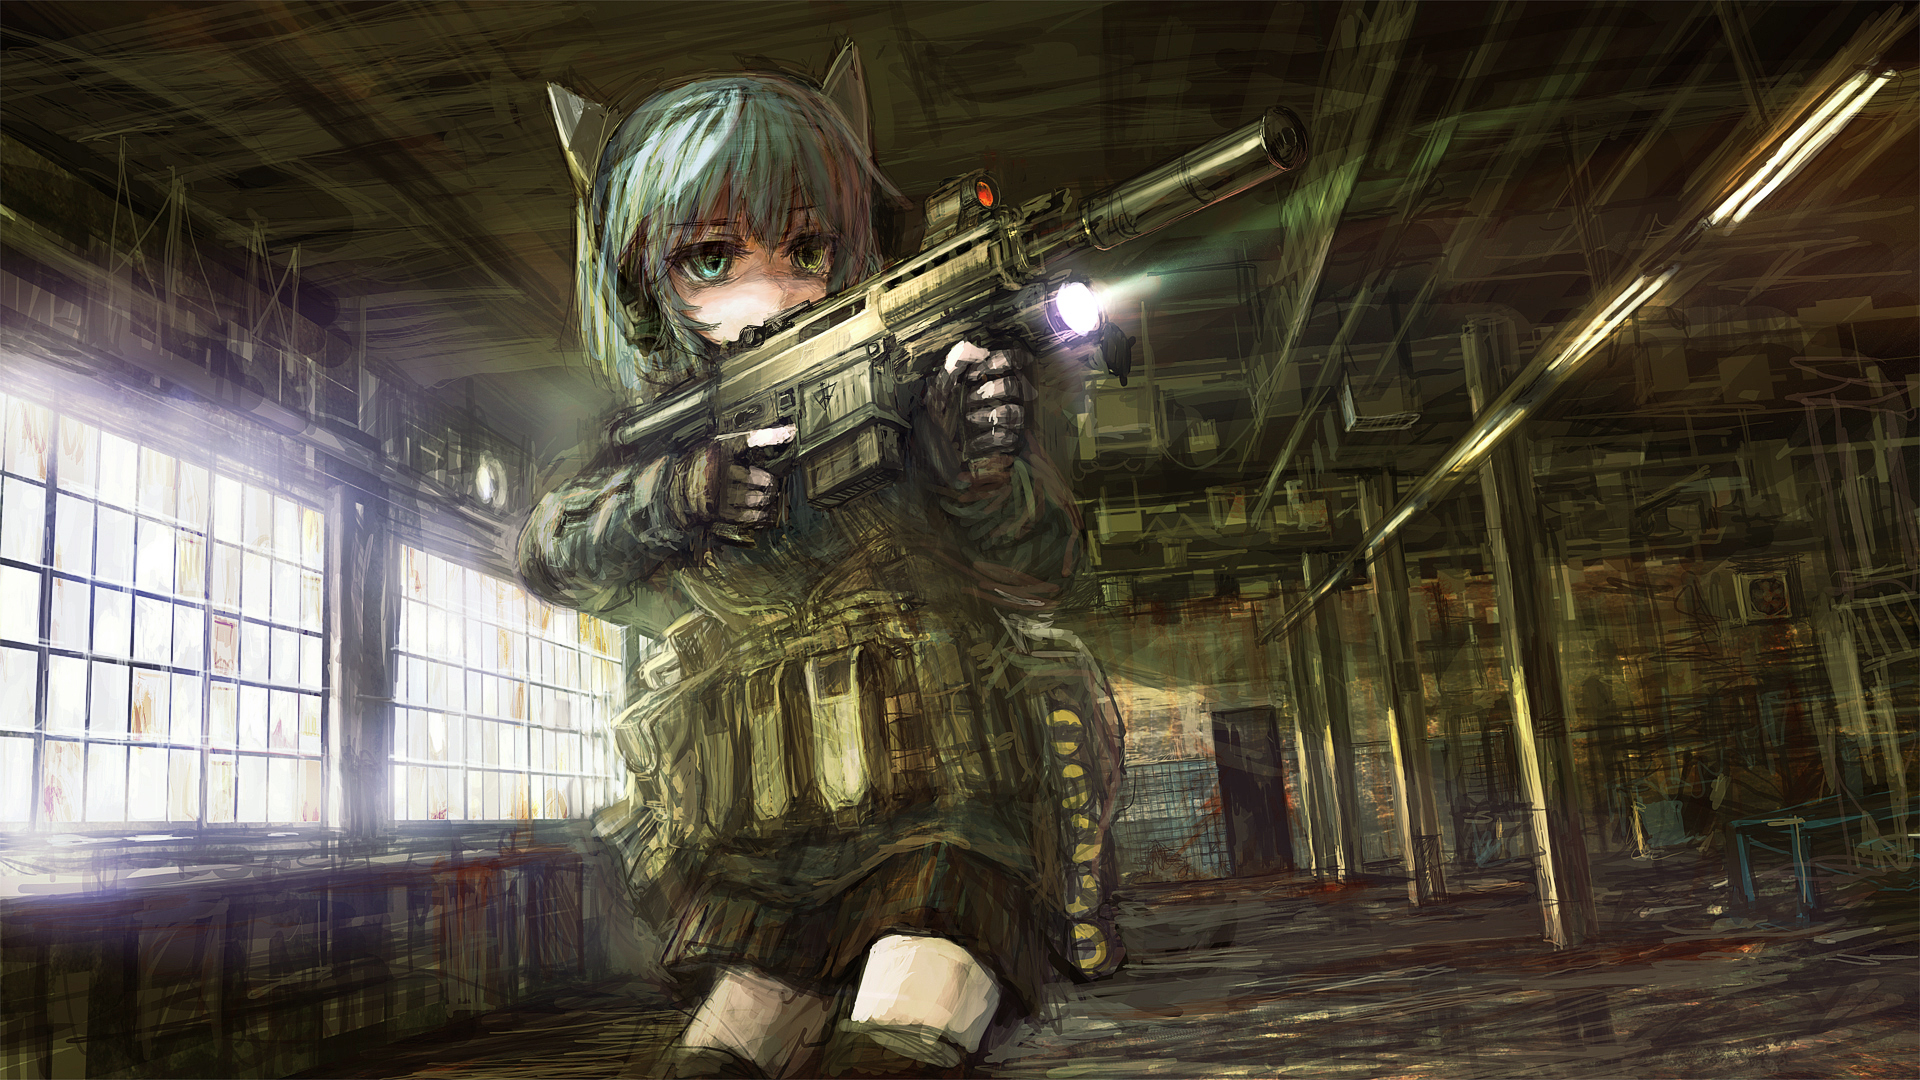 animal_ears aqua_hair bicolored_eyes gloves gun headphones lm7_(op-center) original shorts weapon